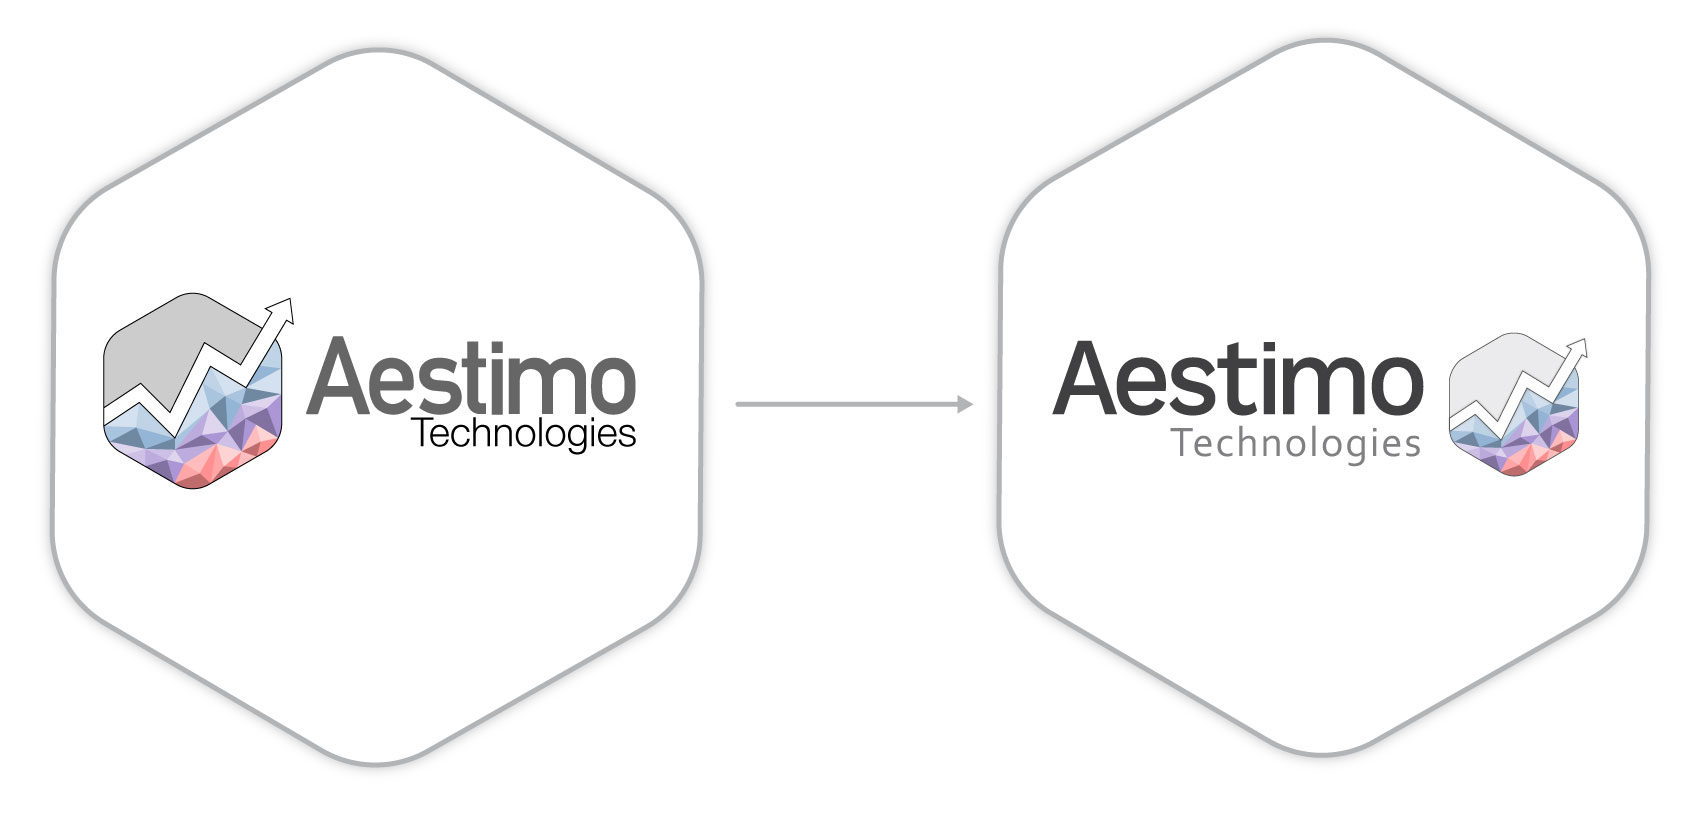 aestimo logo update